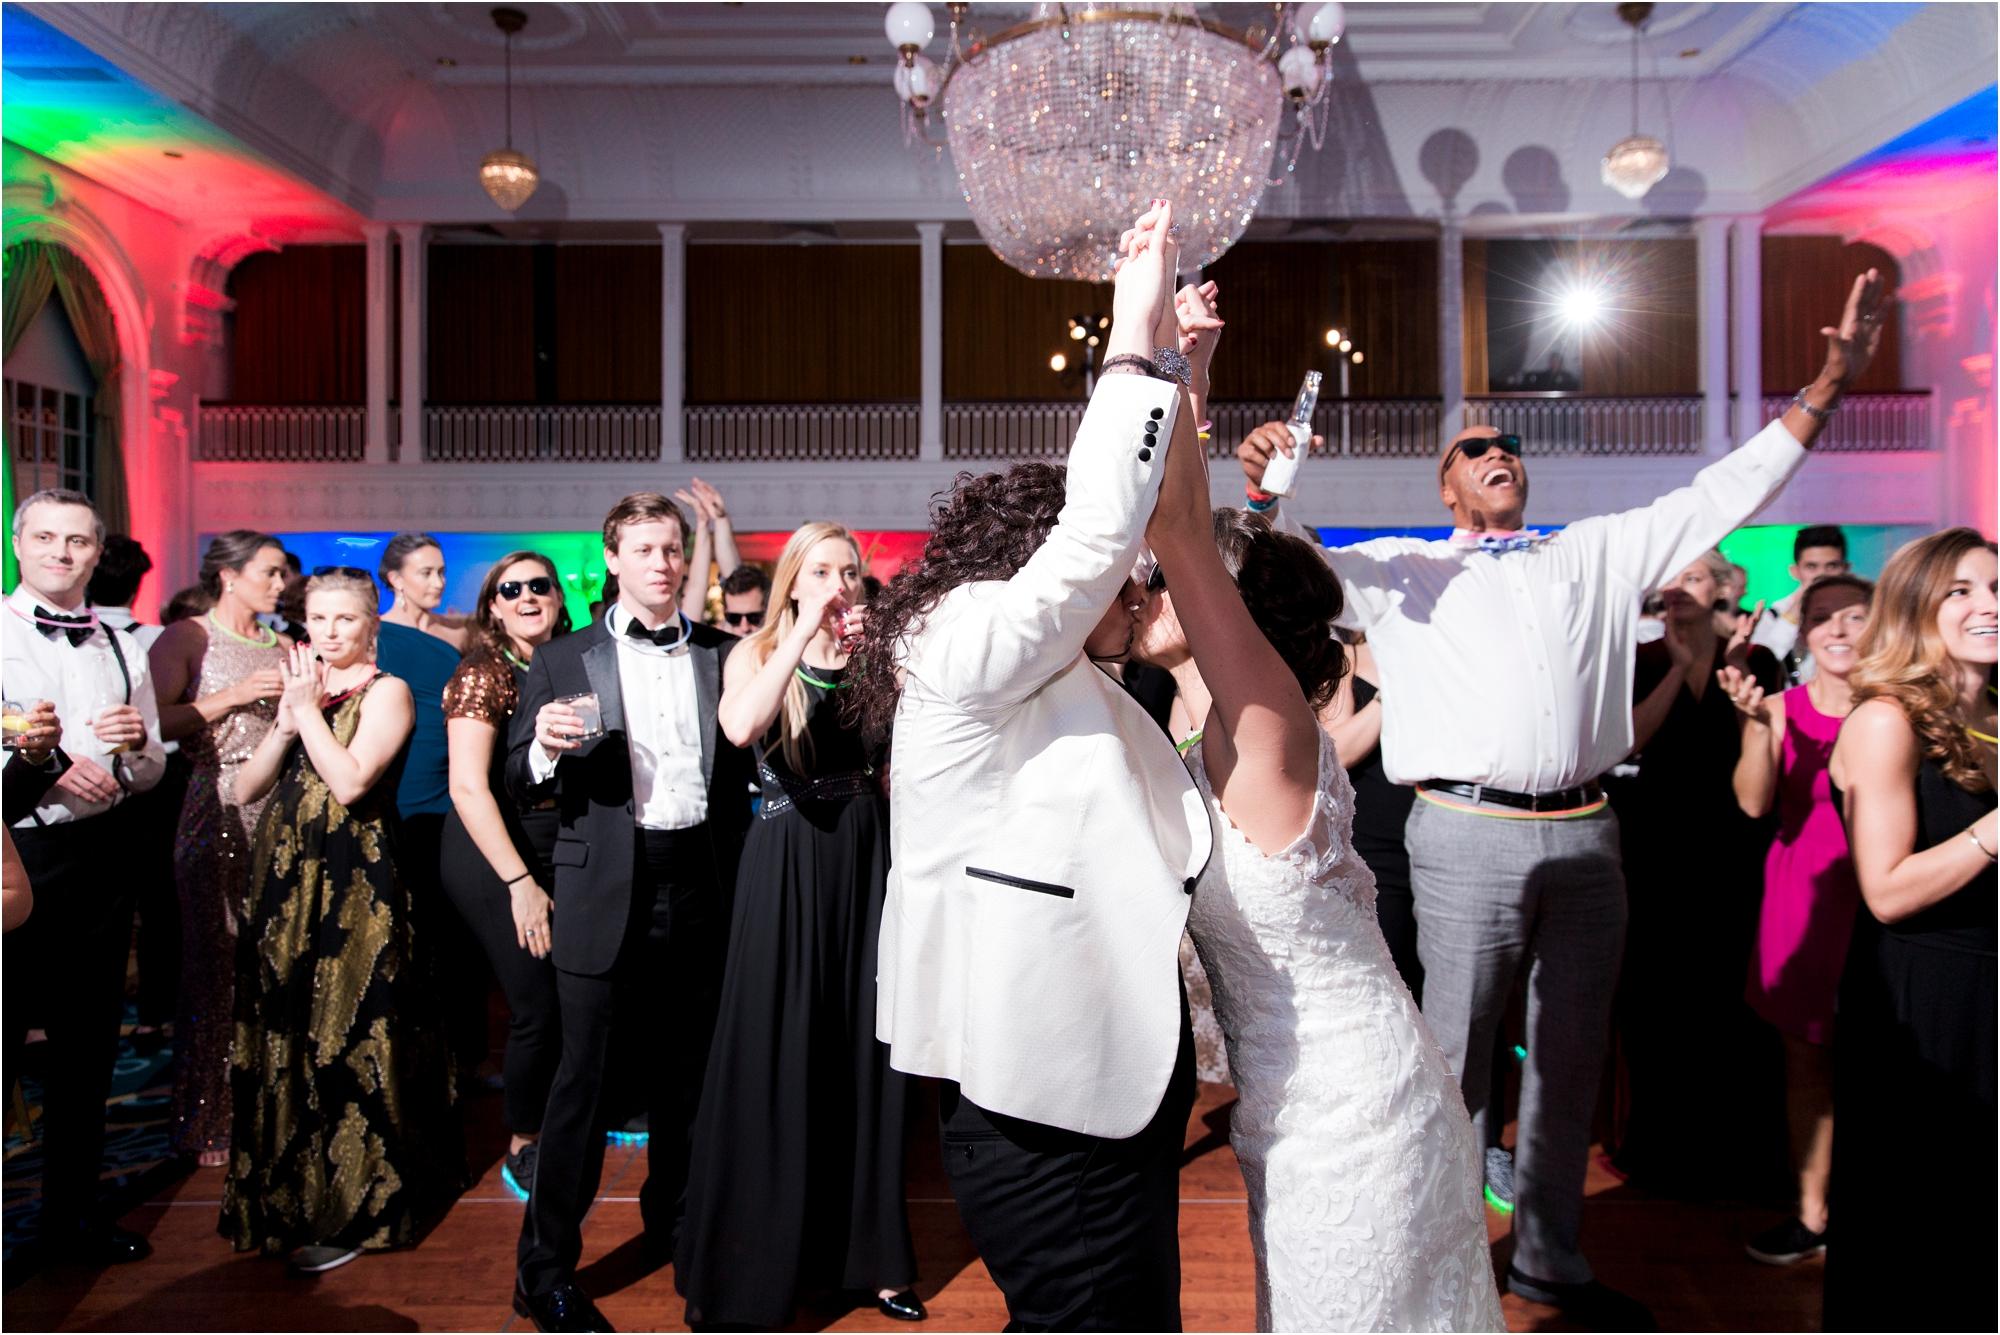 phoebe-mayme-richmond-virginia-colorful-love-is-love-wedding-photos_0056.jpg